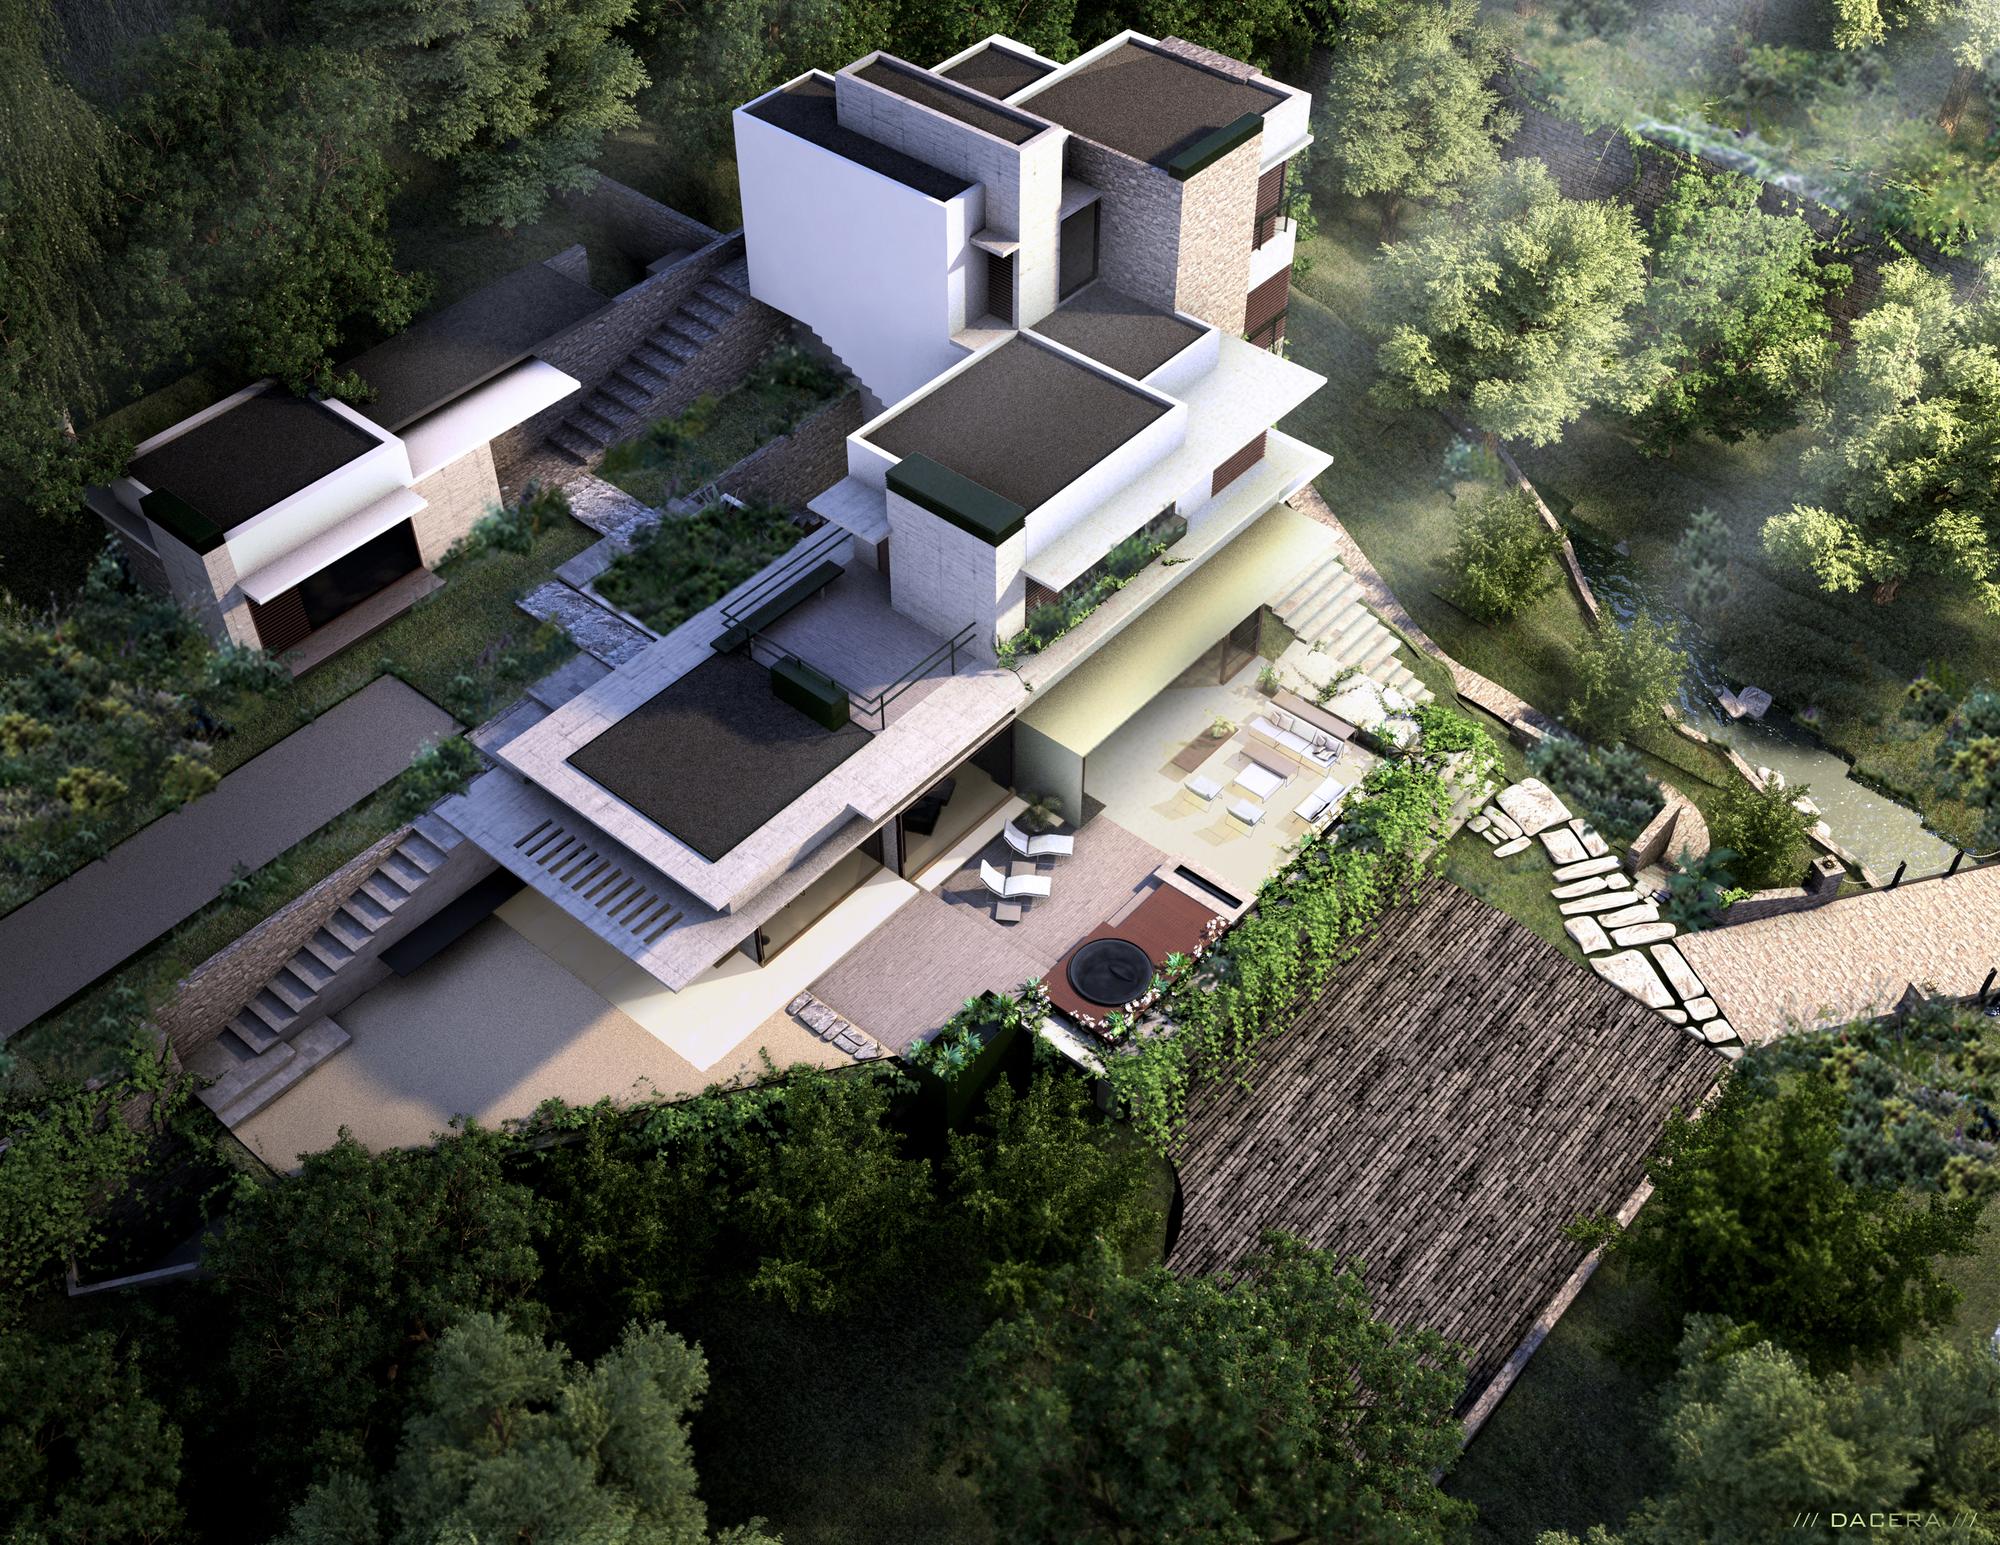 530ebc59c07a802c7600012a_house-maza-chk-arquitectura_mz_render_exterior_02